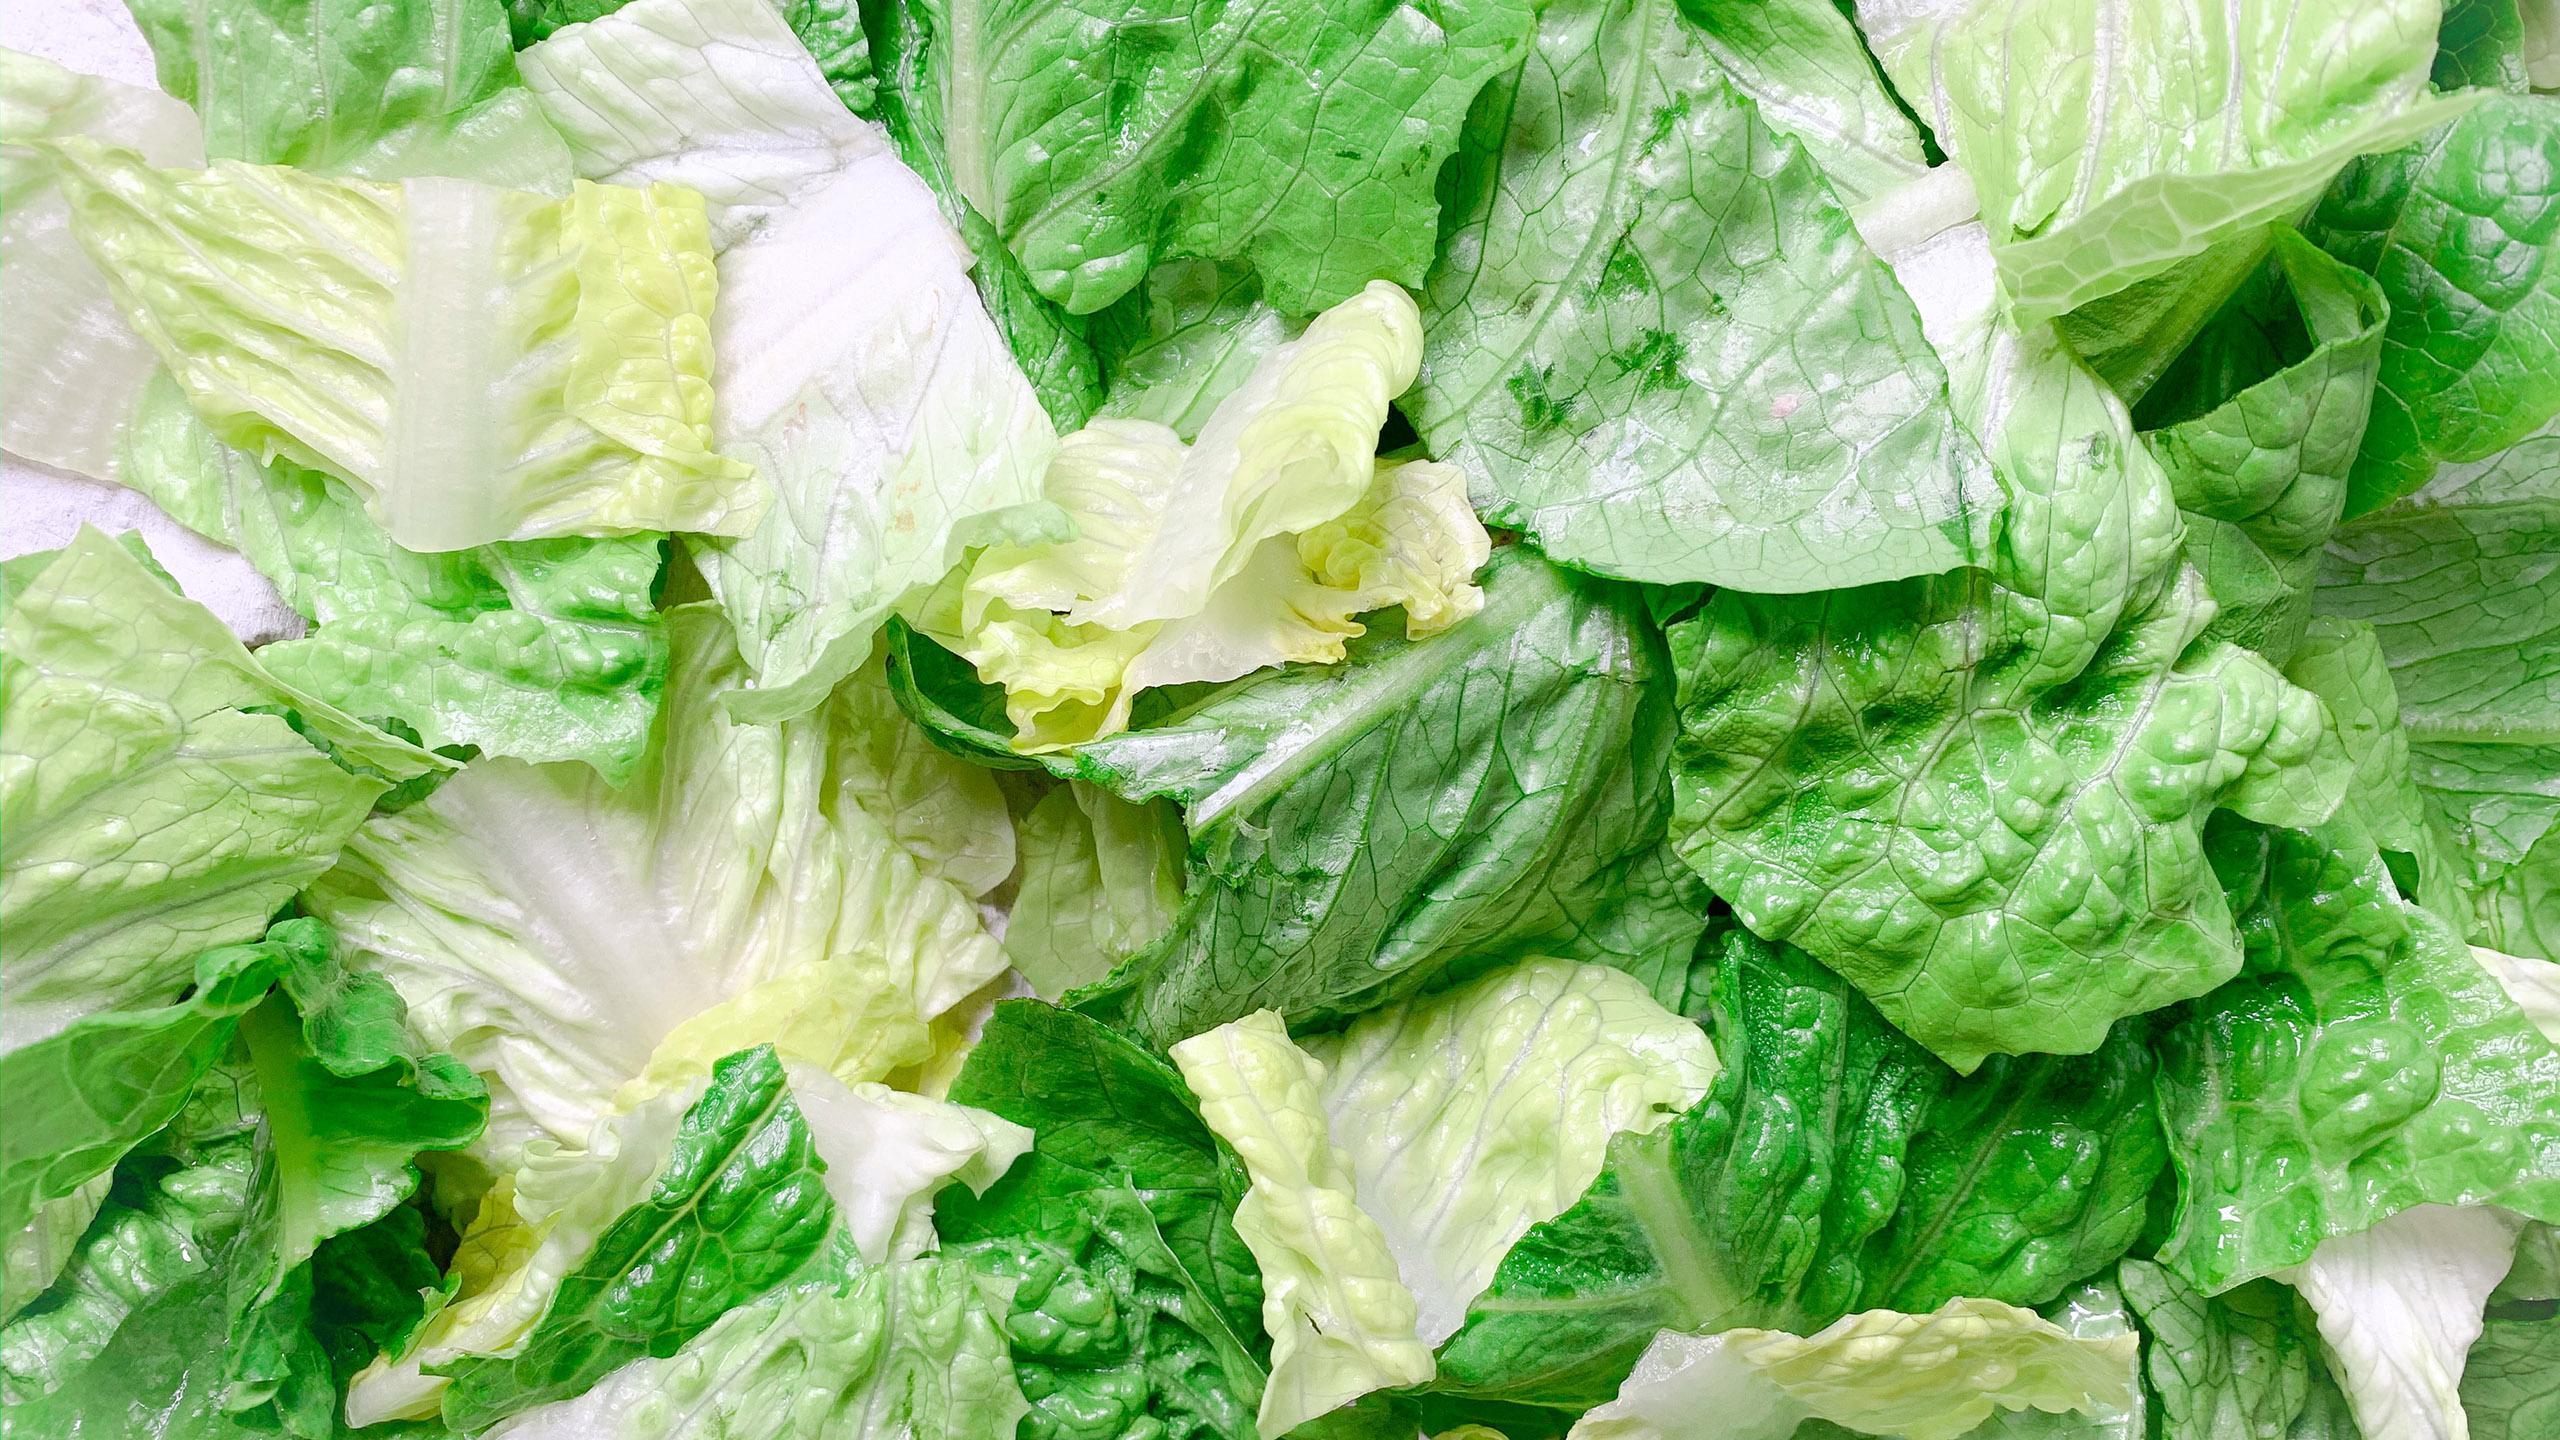 lechuga, hortalizas, tips para revivir comida